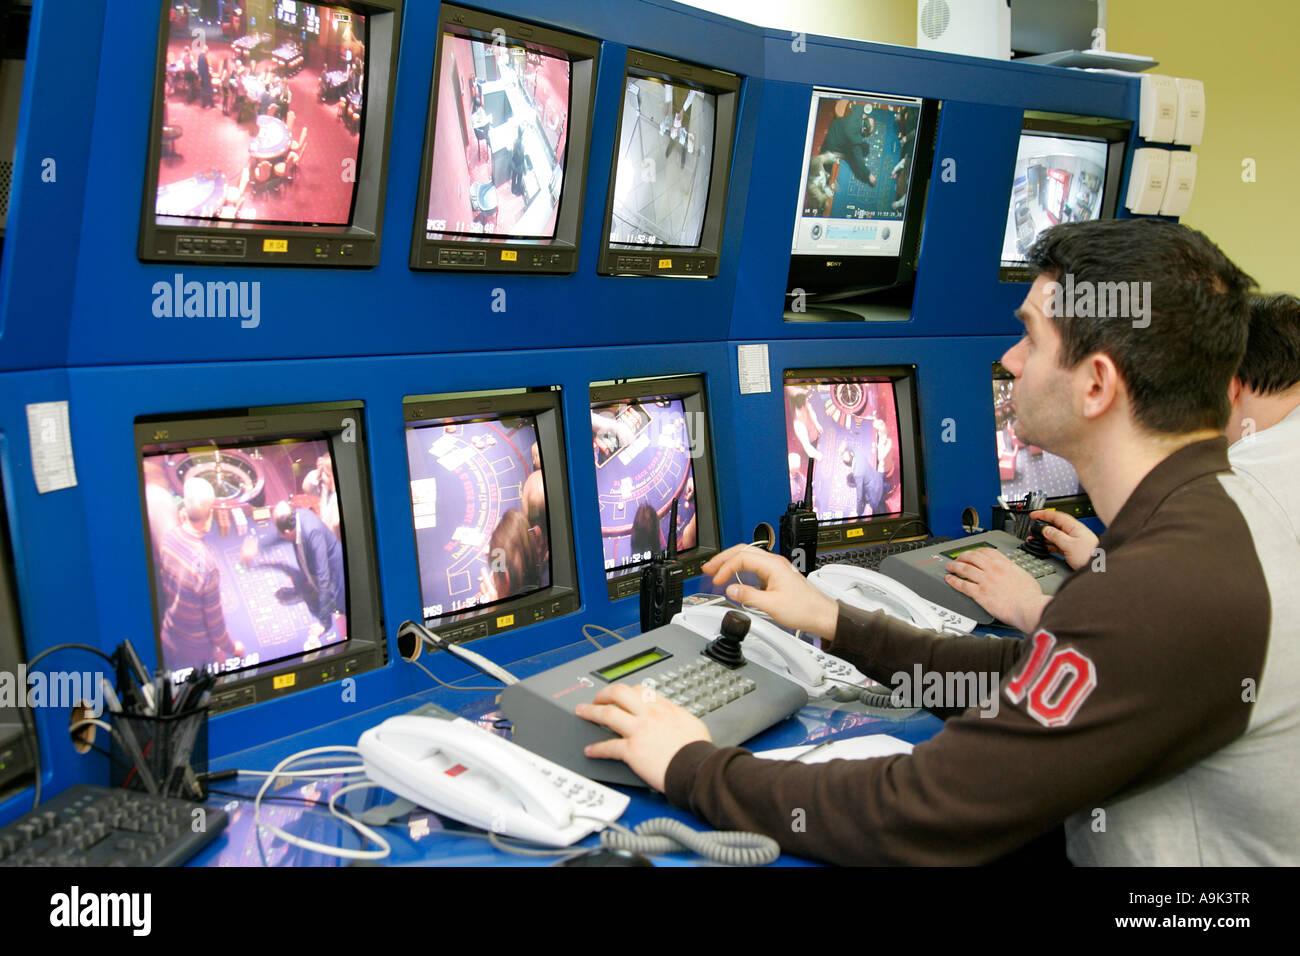 casino secret security monitoring monitor camera cctv no prohibit Stock  Photo - Alamy